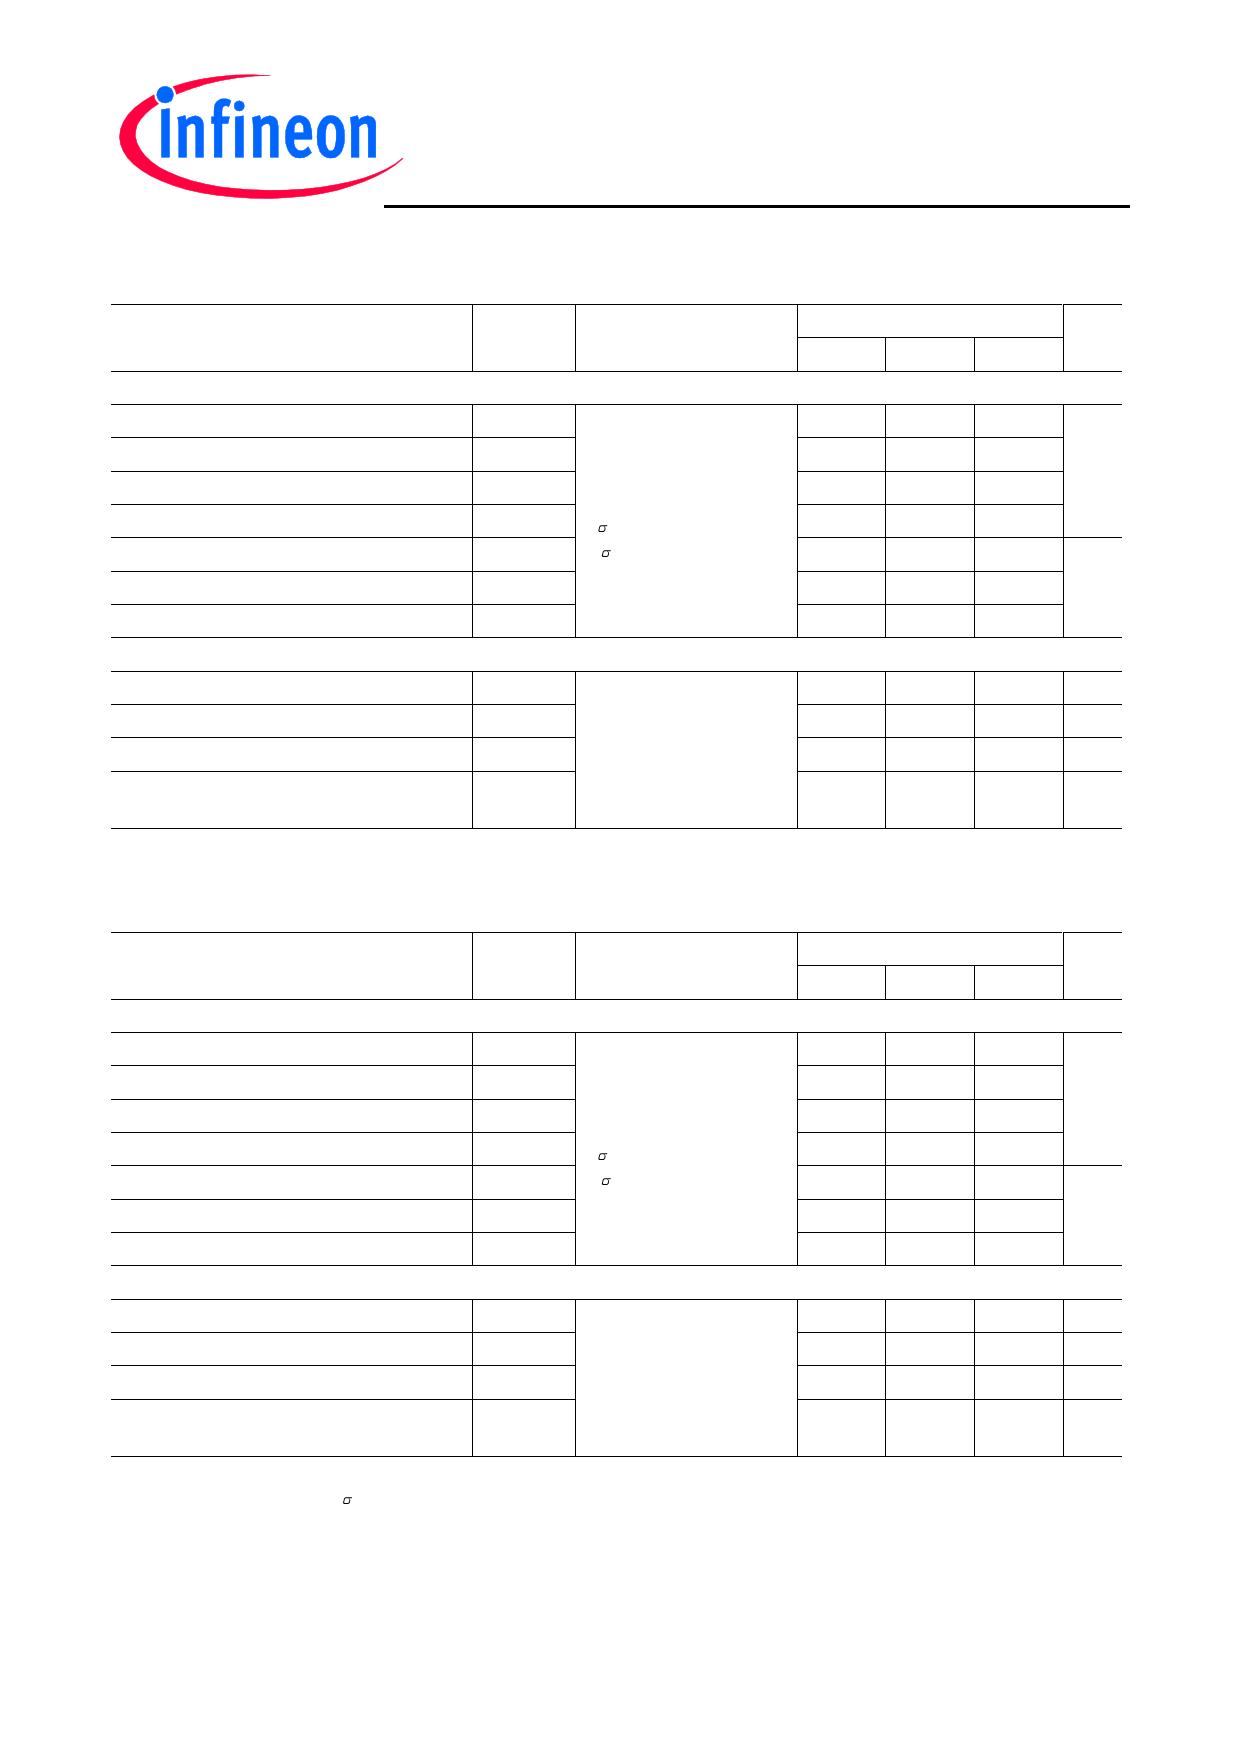 IKP04N60T pdf, ピン配列